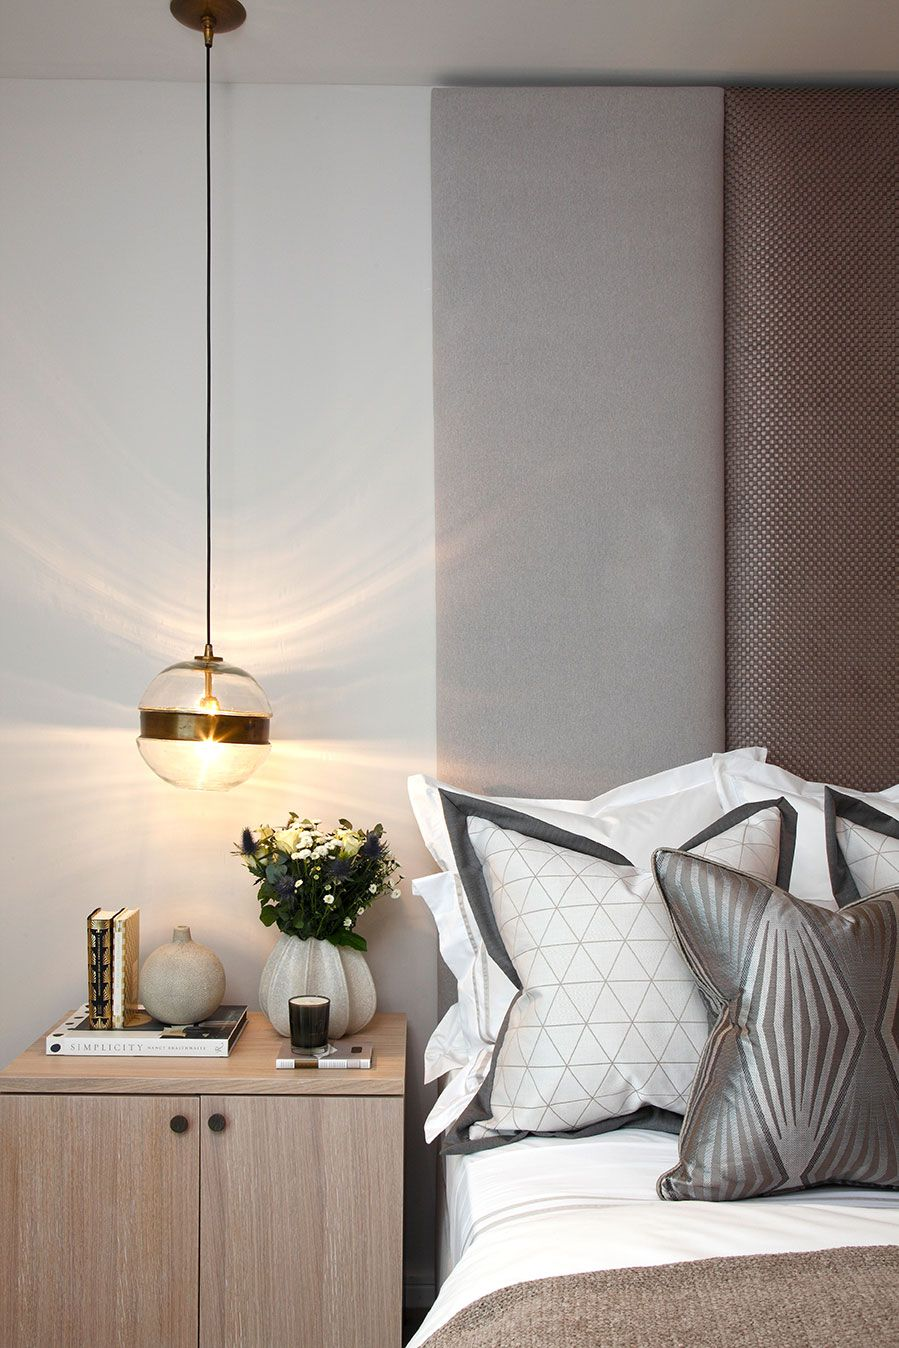 Bedside Manner - James Balston Photography  Stylish bedroom decor